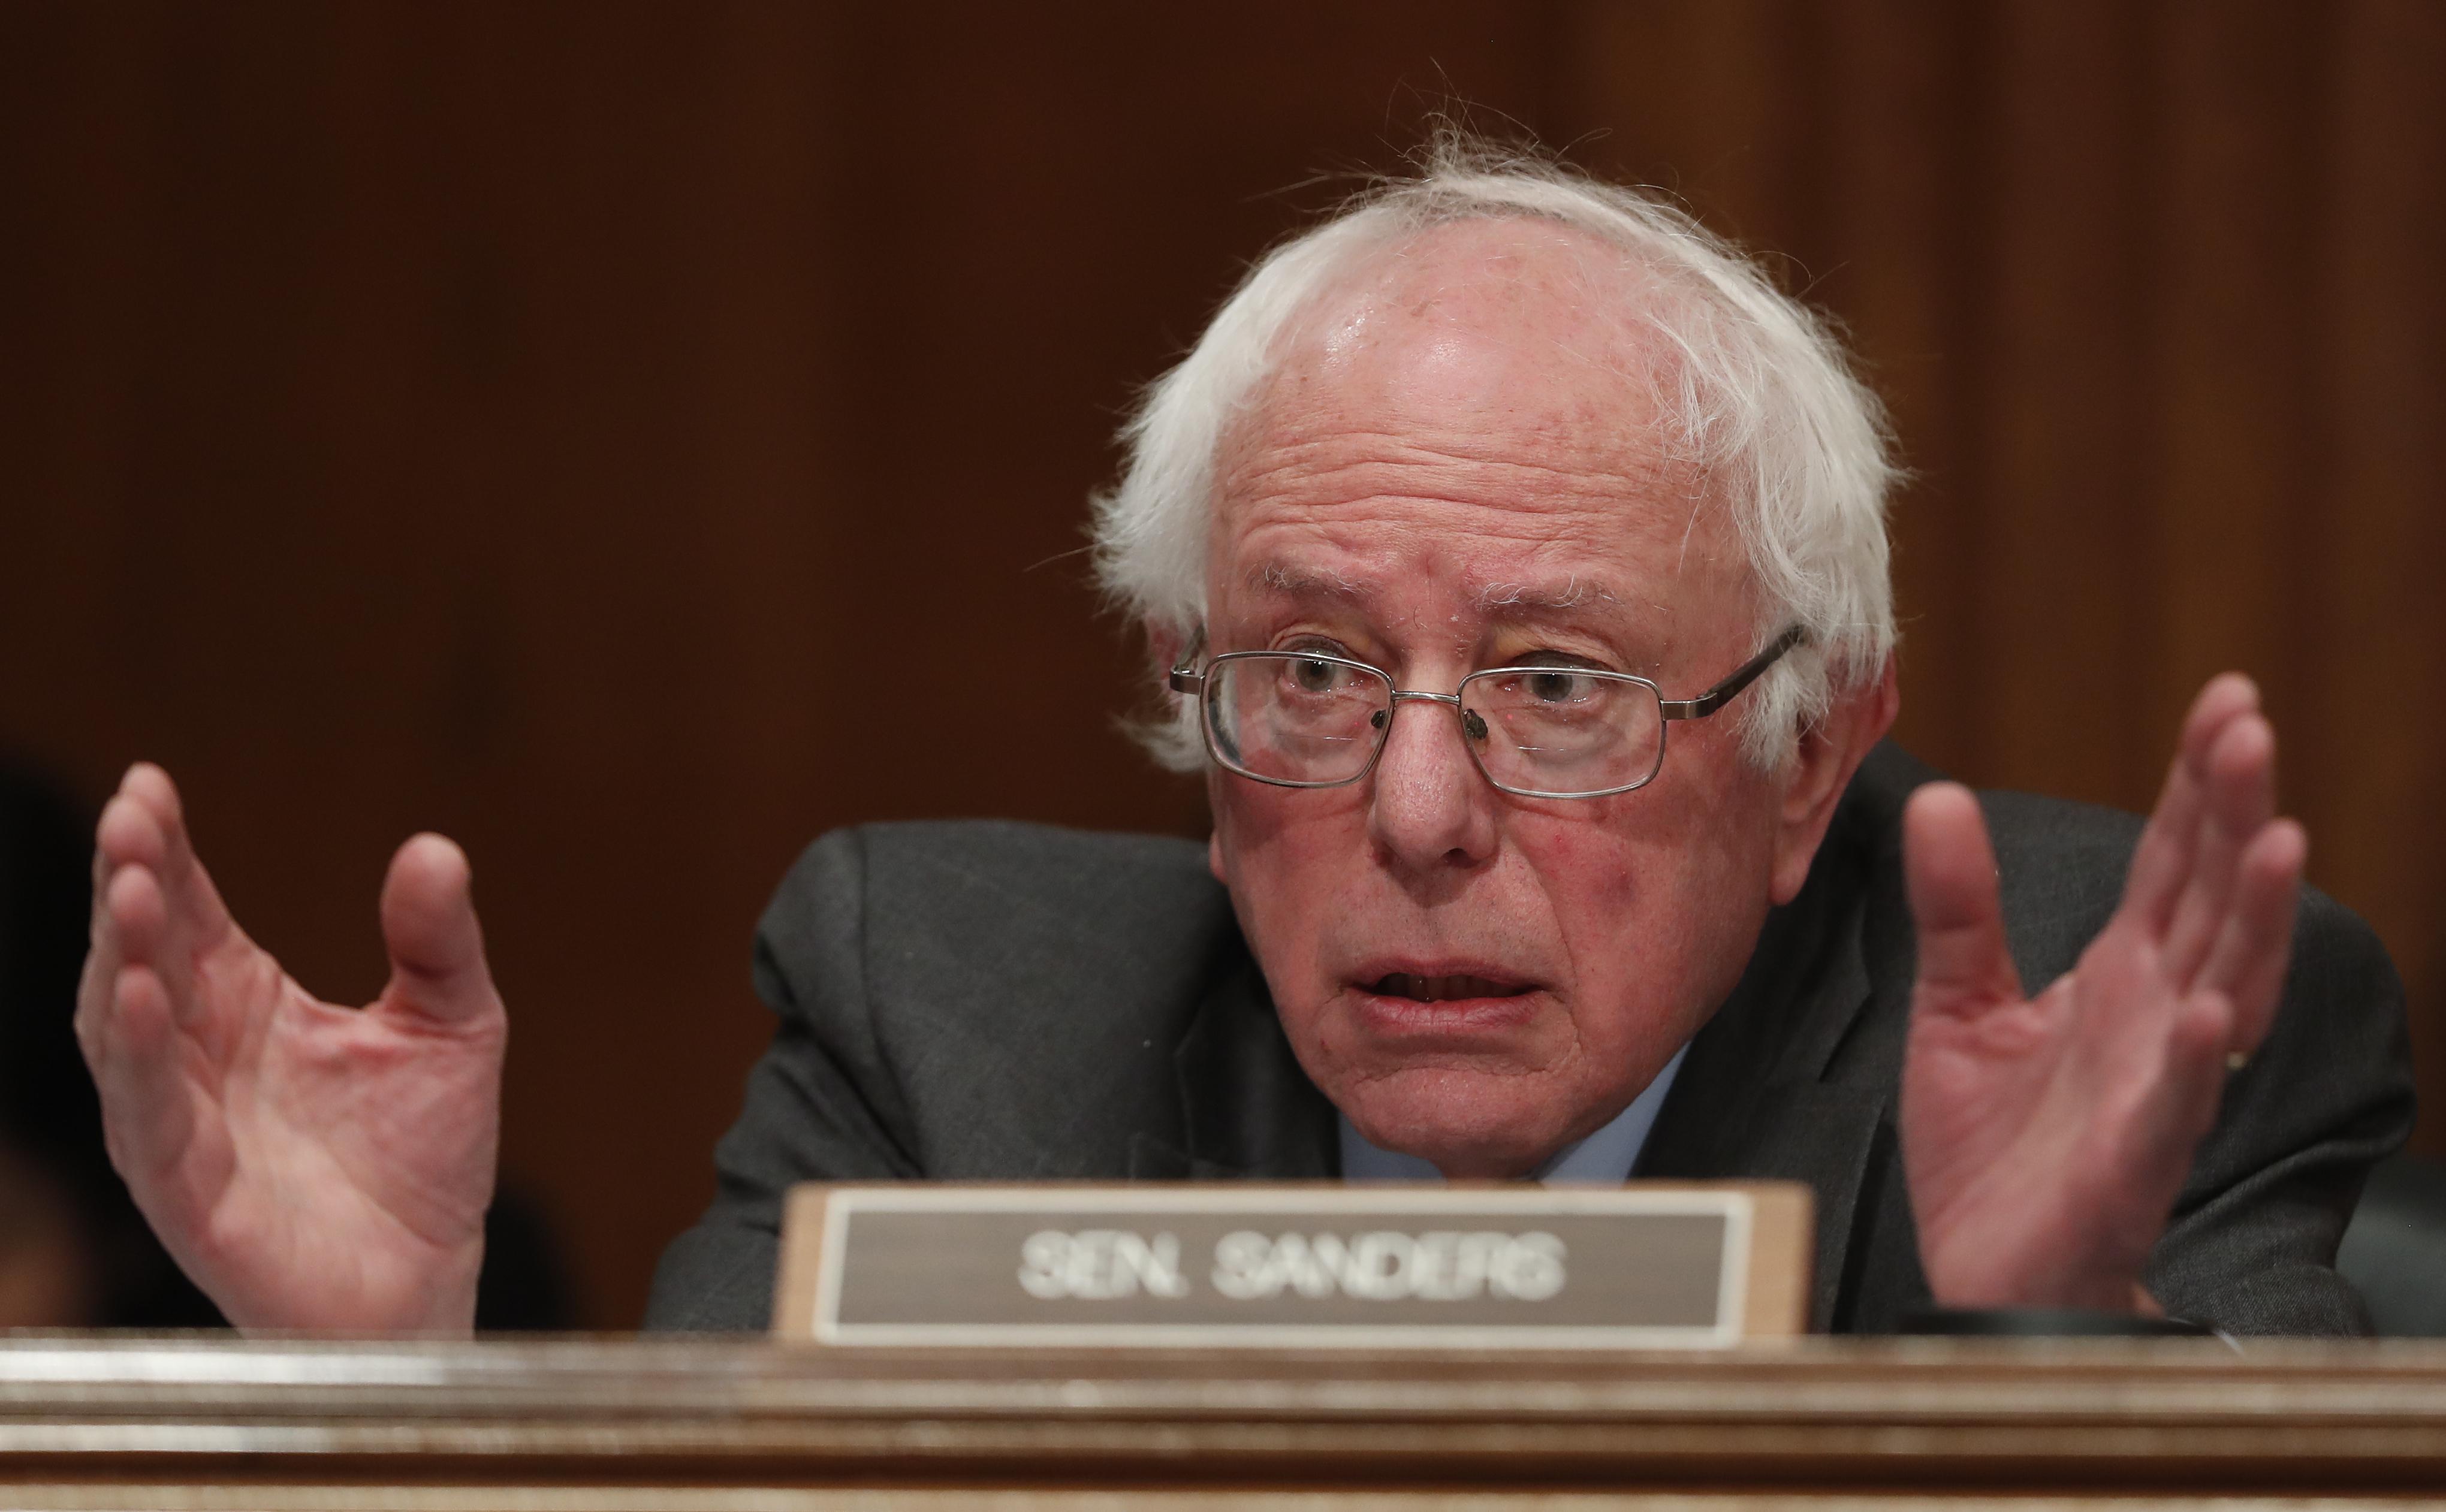 Senate Environment and Public Works Committee member Sen. Bernard Sanders, I-Vt. on Capitol Hill in Washington on Jan. 18, 2017. (AP Photo/Carolyn Kaster)